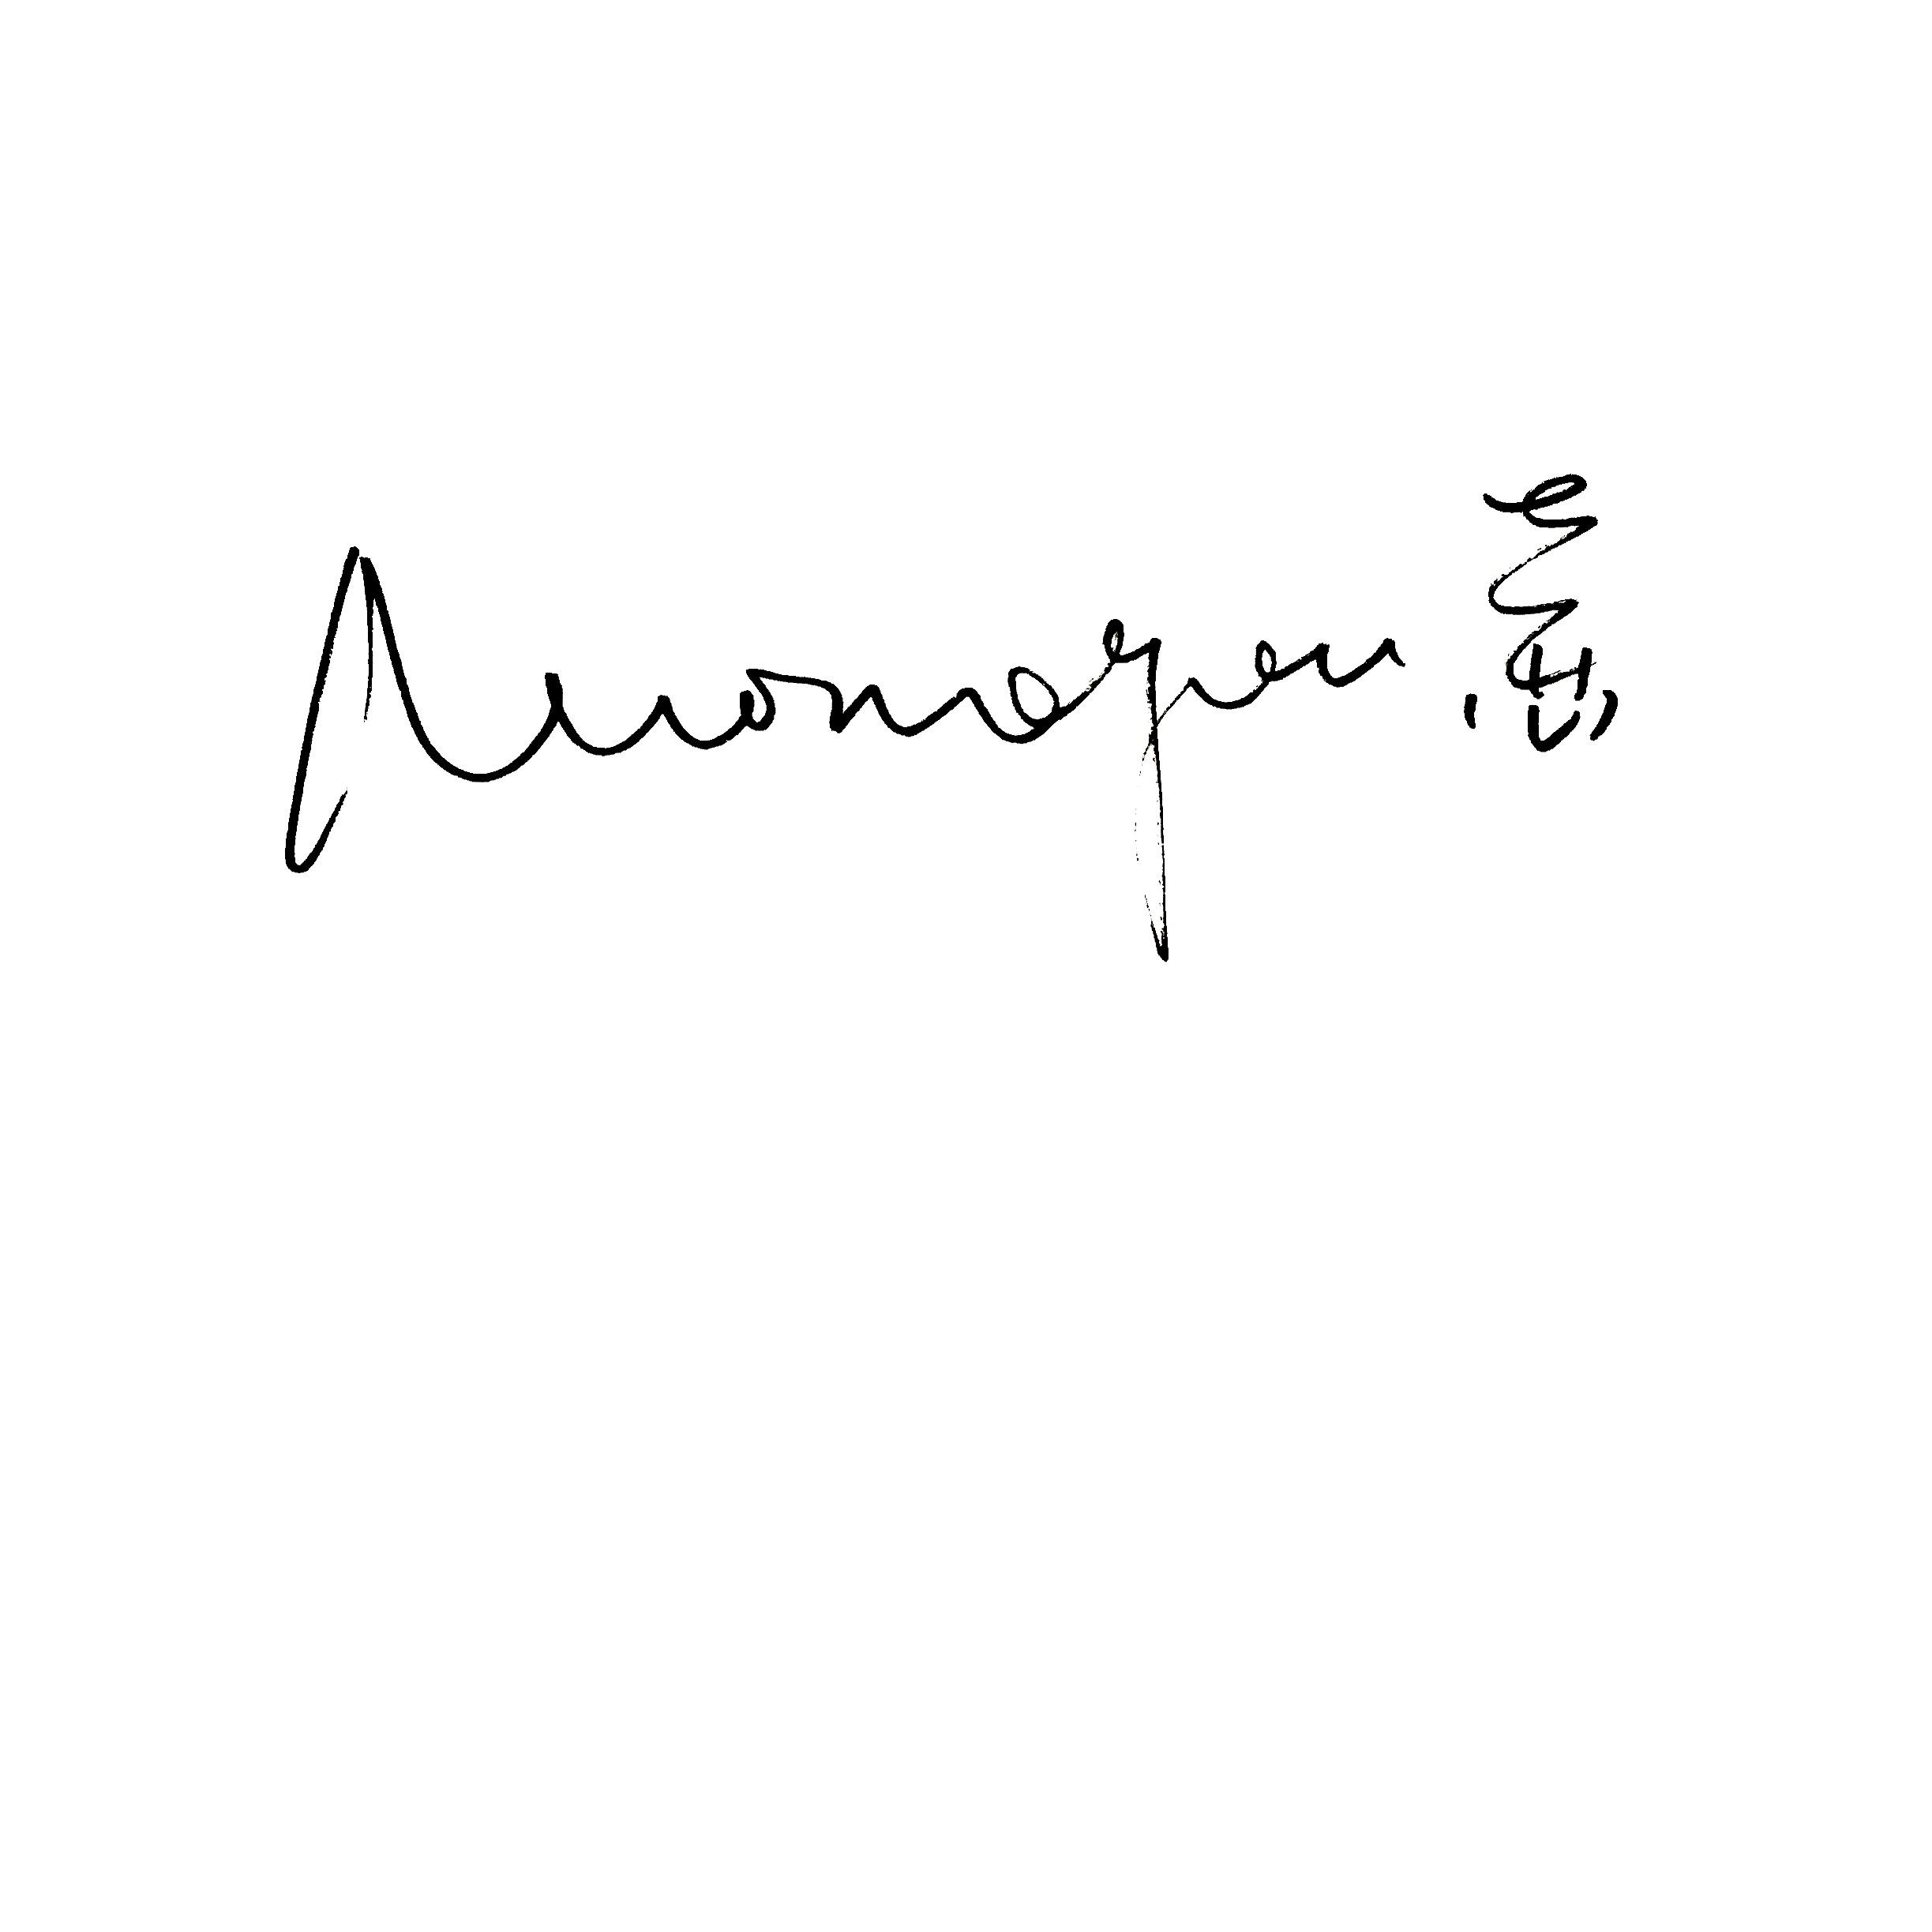 Momoyan Evan-Jones's Signature